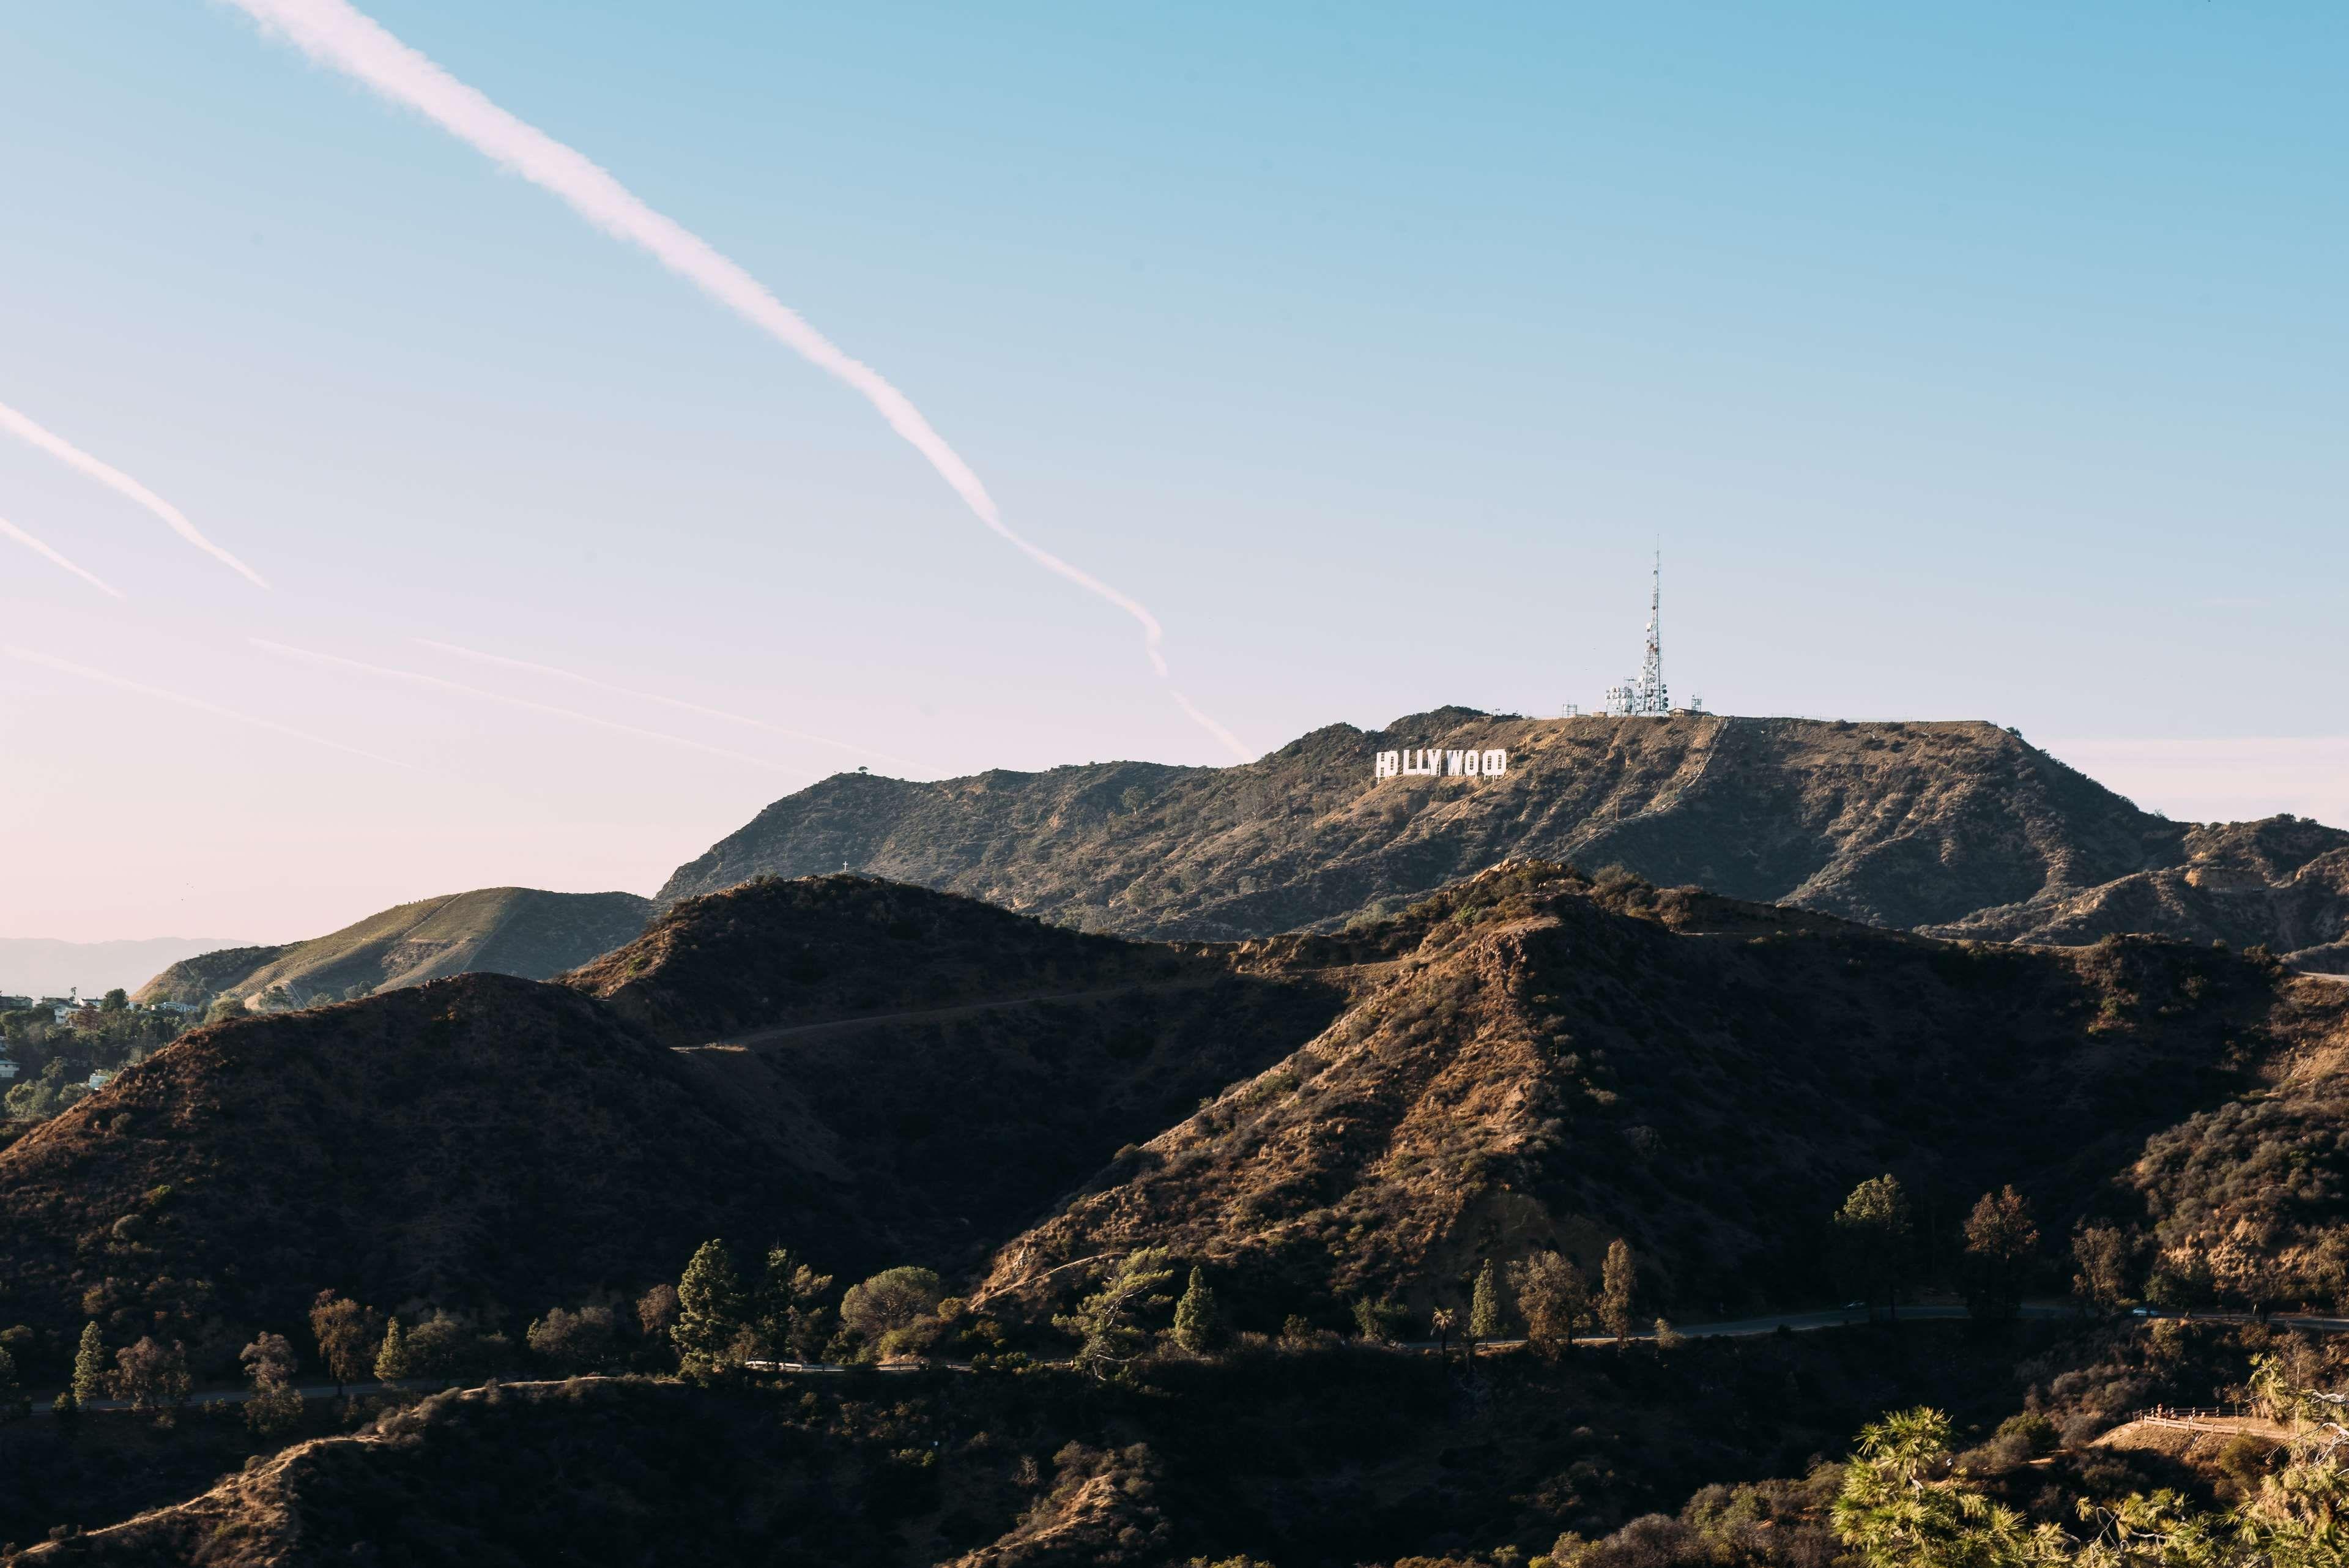 Fantastic Wallpaper Mountain Hollywood - 0b0975335be4954ab392e5d77c5bc98b  2018_58713.jpg